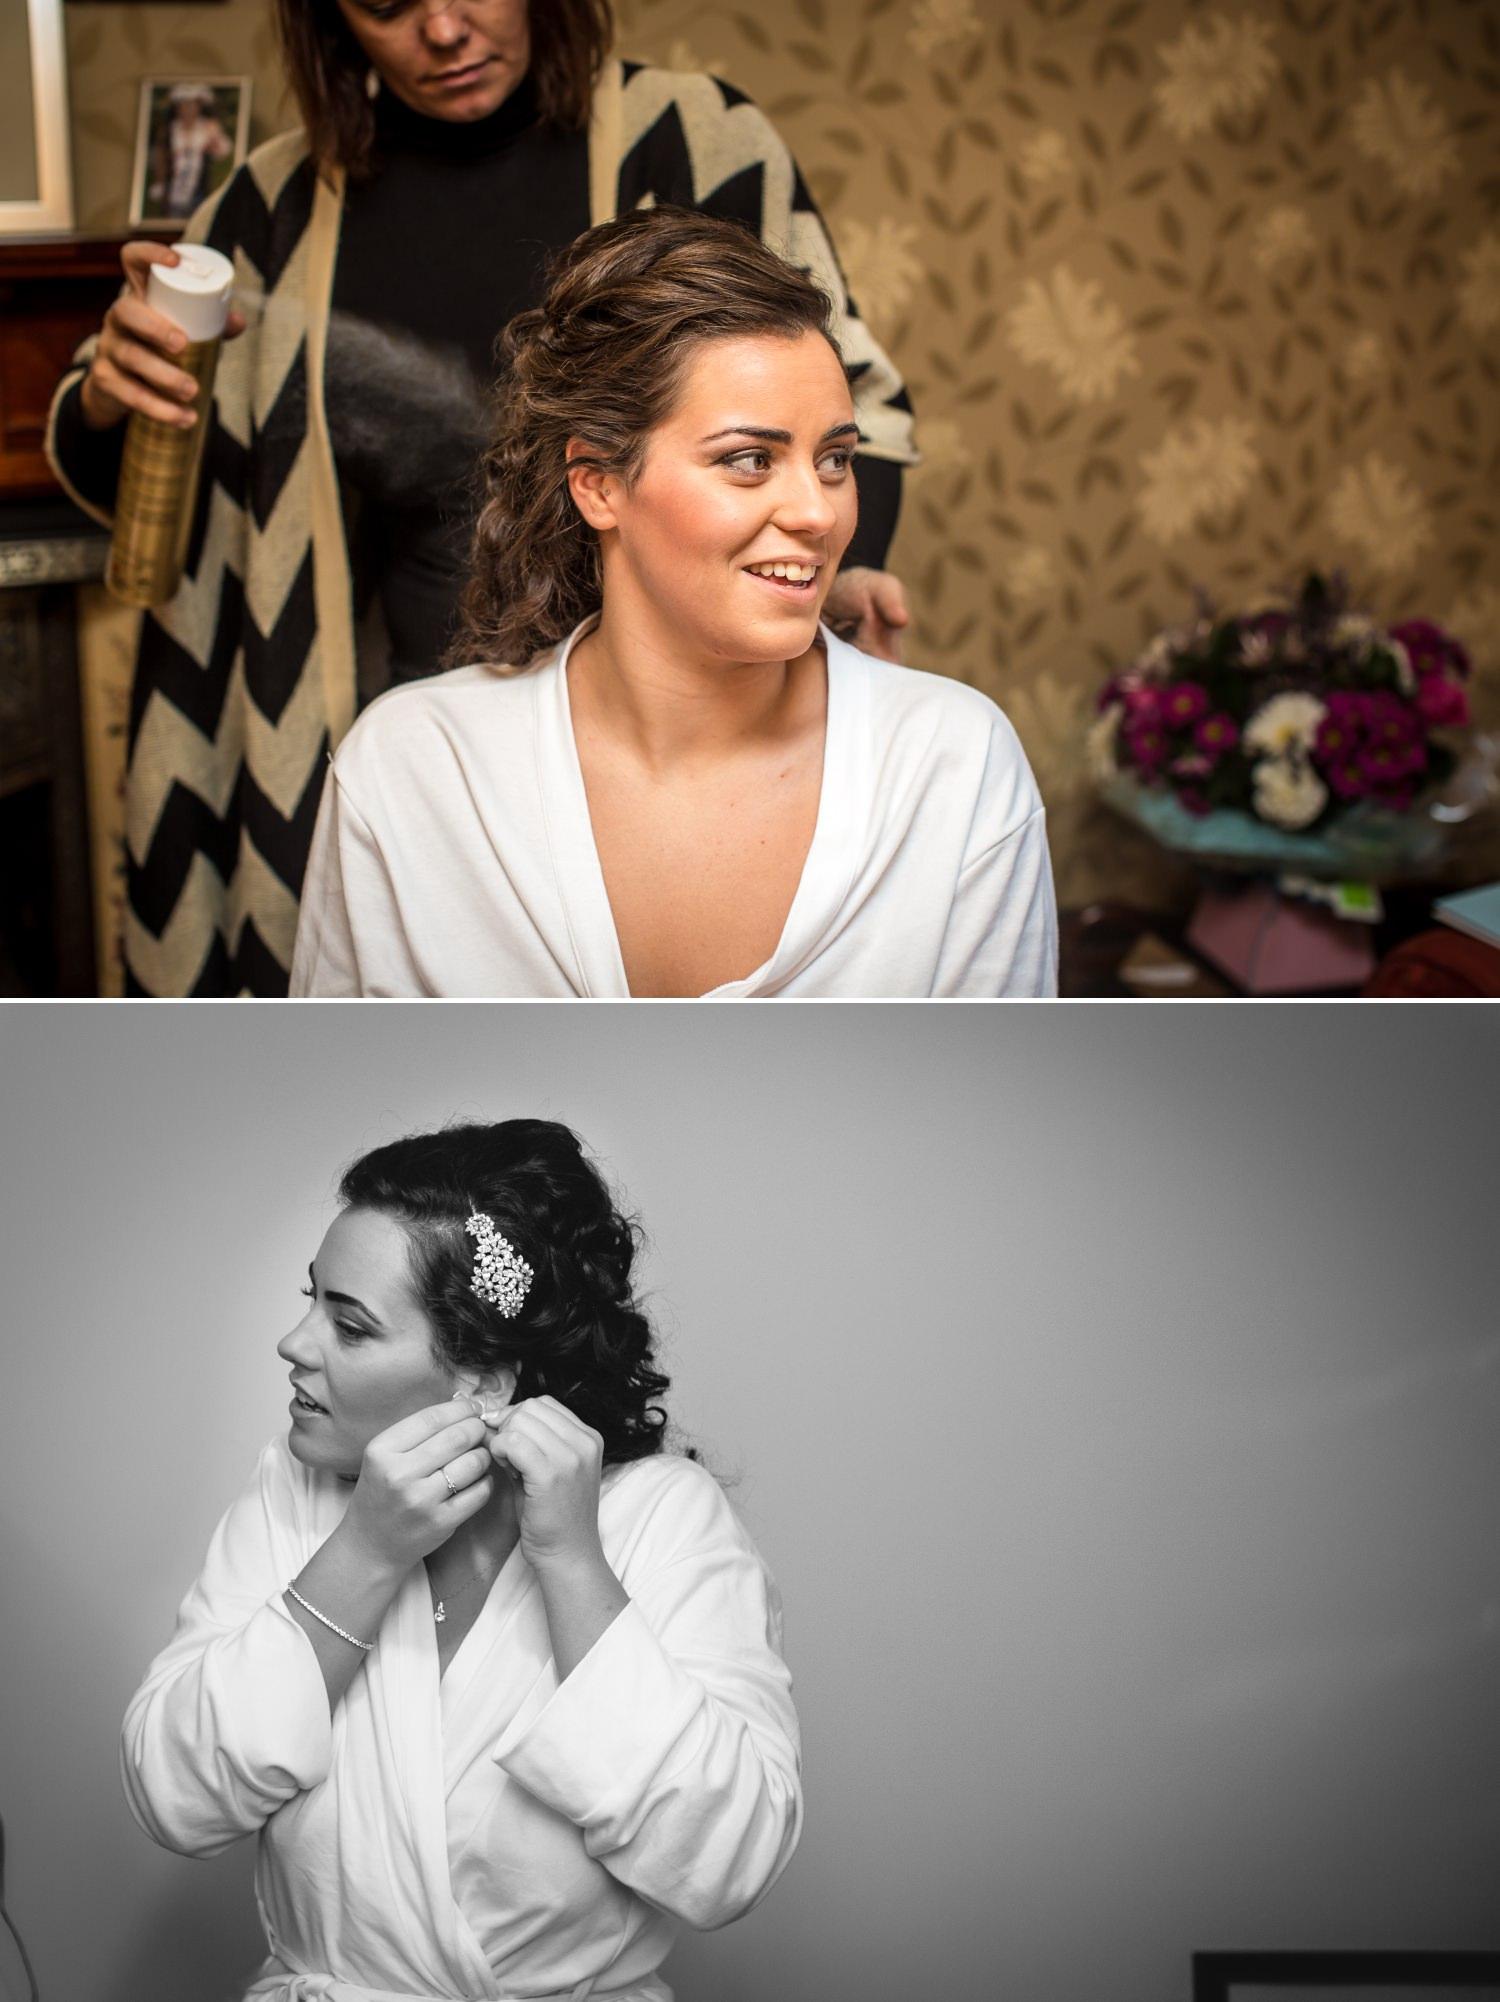 Wedding photographer North Wales, Llandudno, photograph of bride getting ready